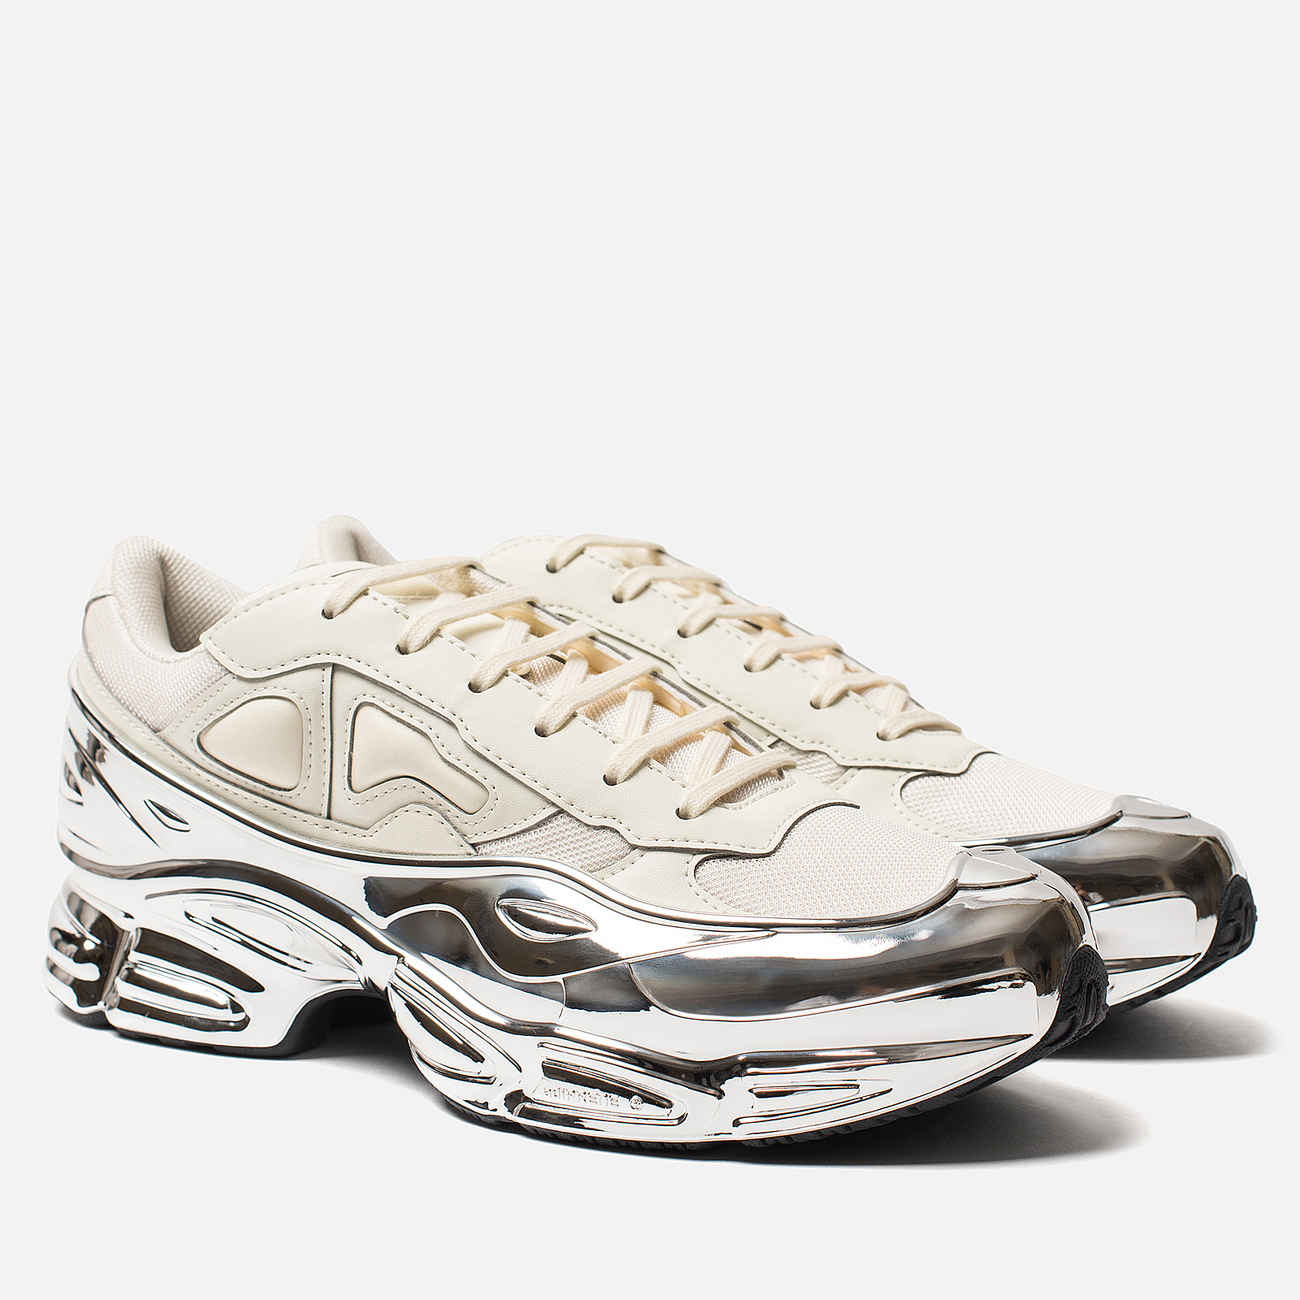 Кроссовки adidas Originals x Raf Simons Ozweego Cream White/Silver Metallic/Silver Metallic